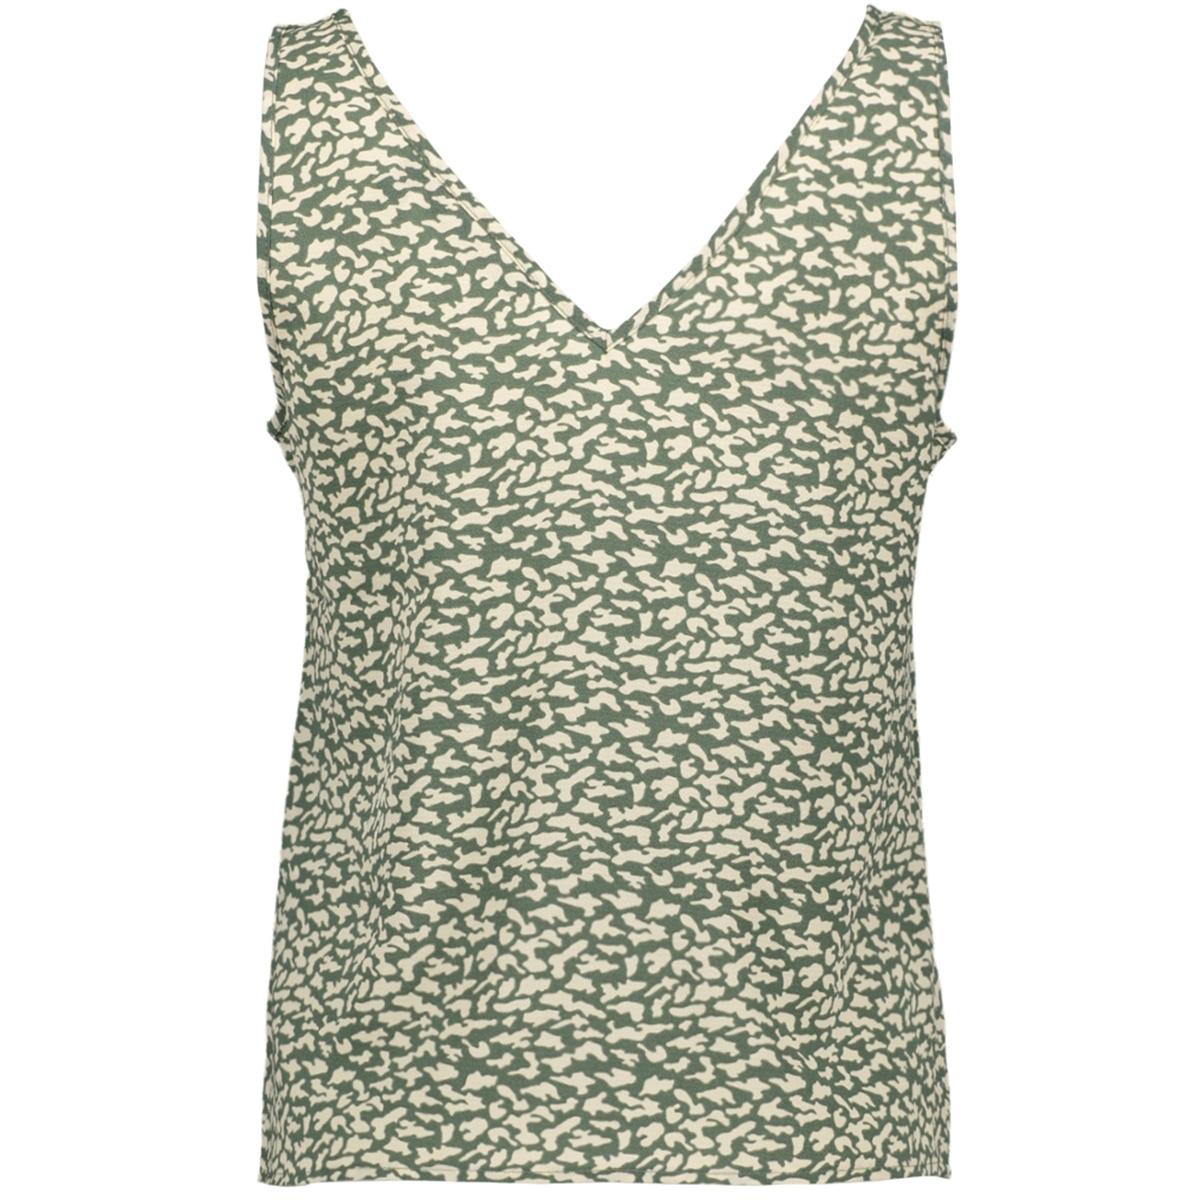 vmsasha sl button top color 10228474 vero moda top laurel wreath/kira